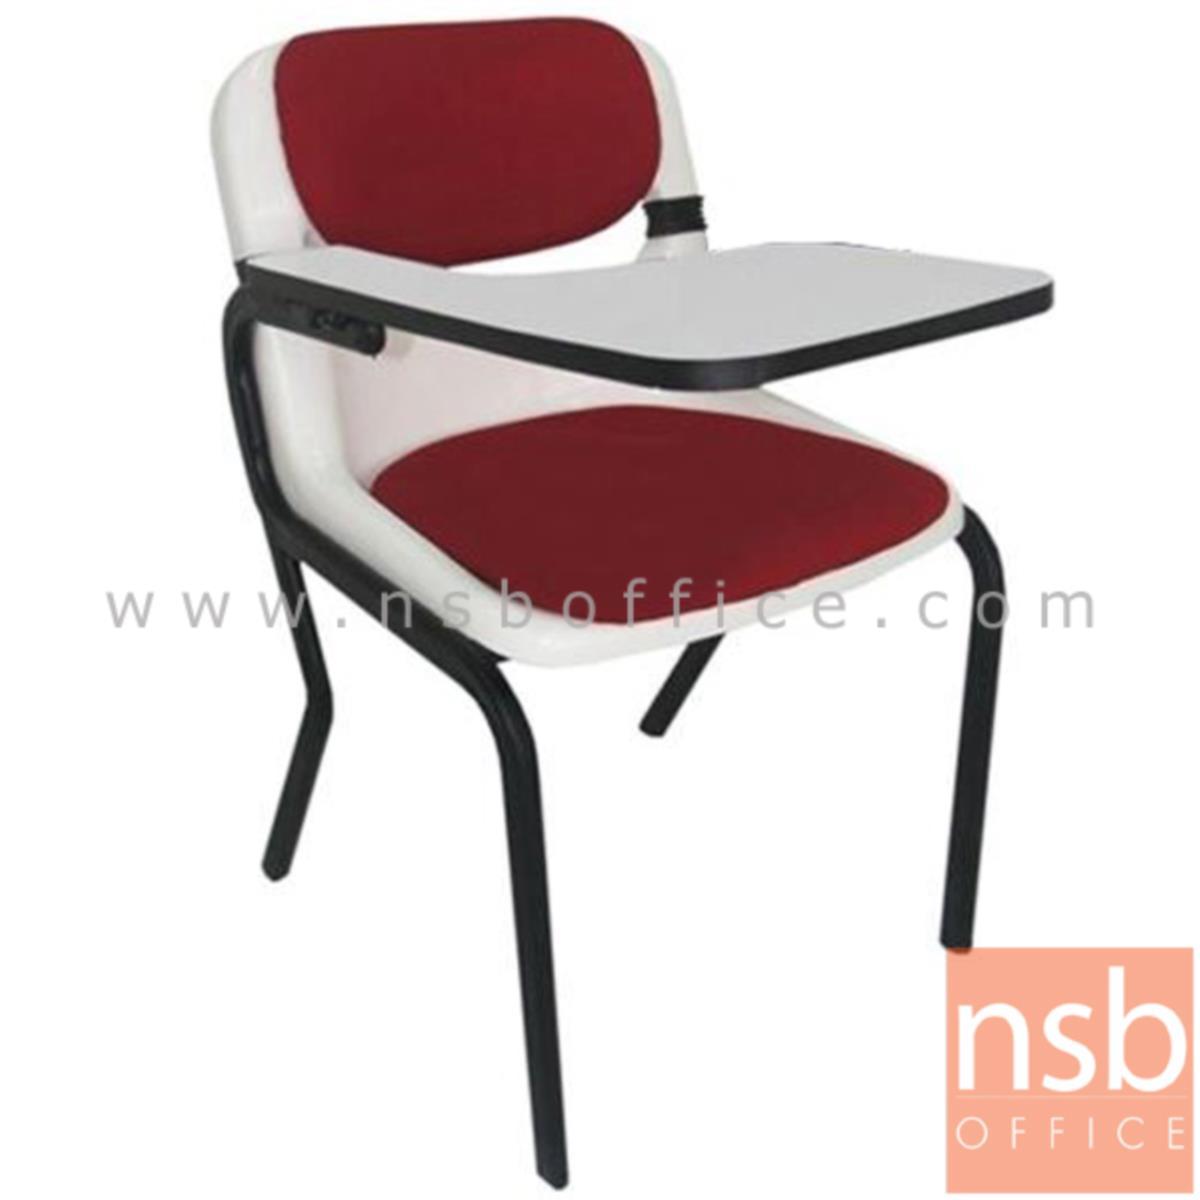 B07A068:เก้าอี้เลคเชอร์เฟรมโพลี่ รุ่น B-790 ขาเหล็กท่อแป๊บไข่พ่นสีดำ